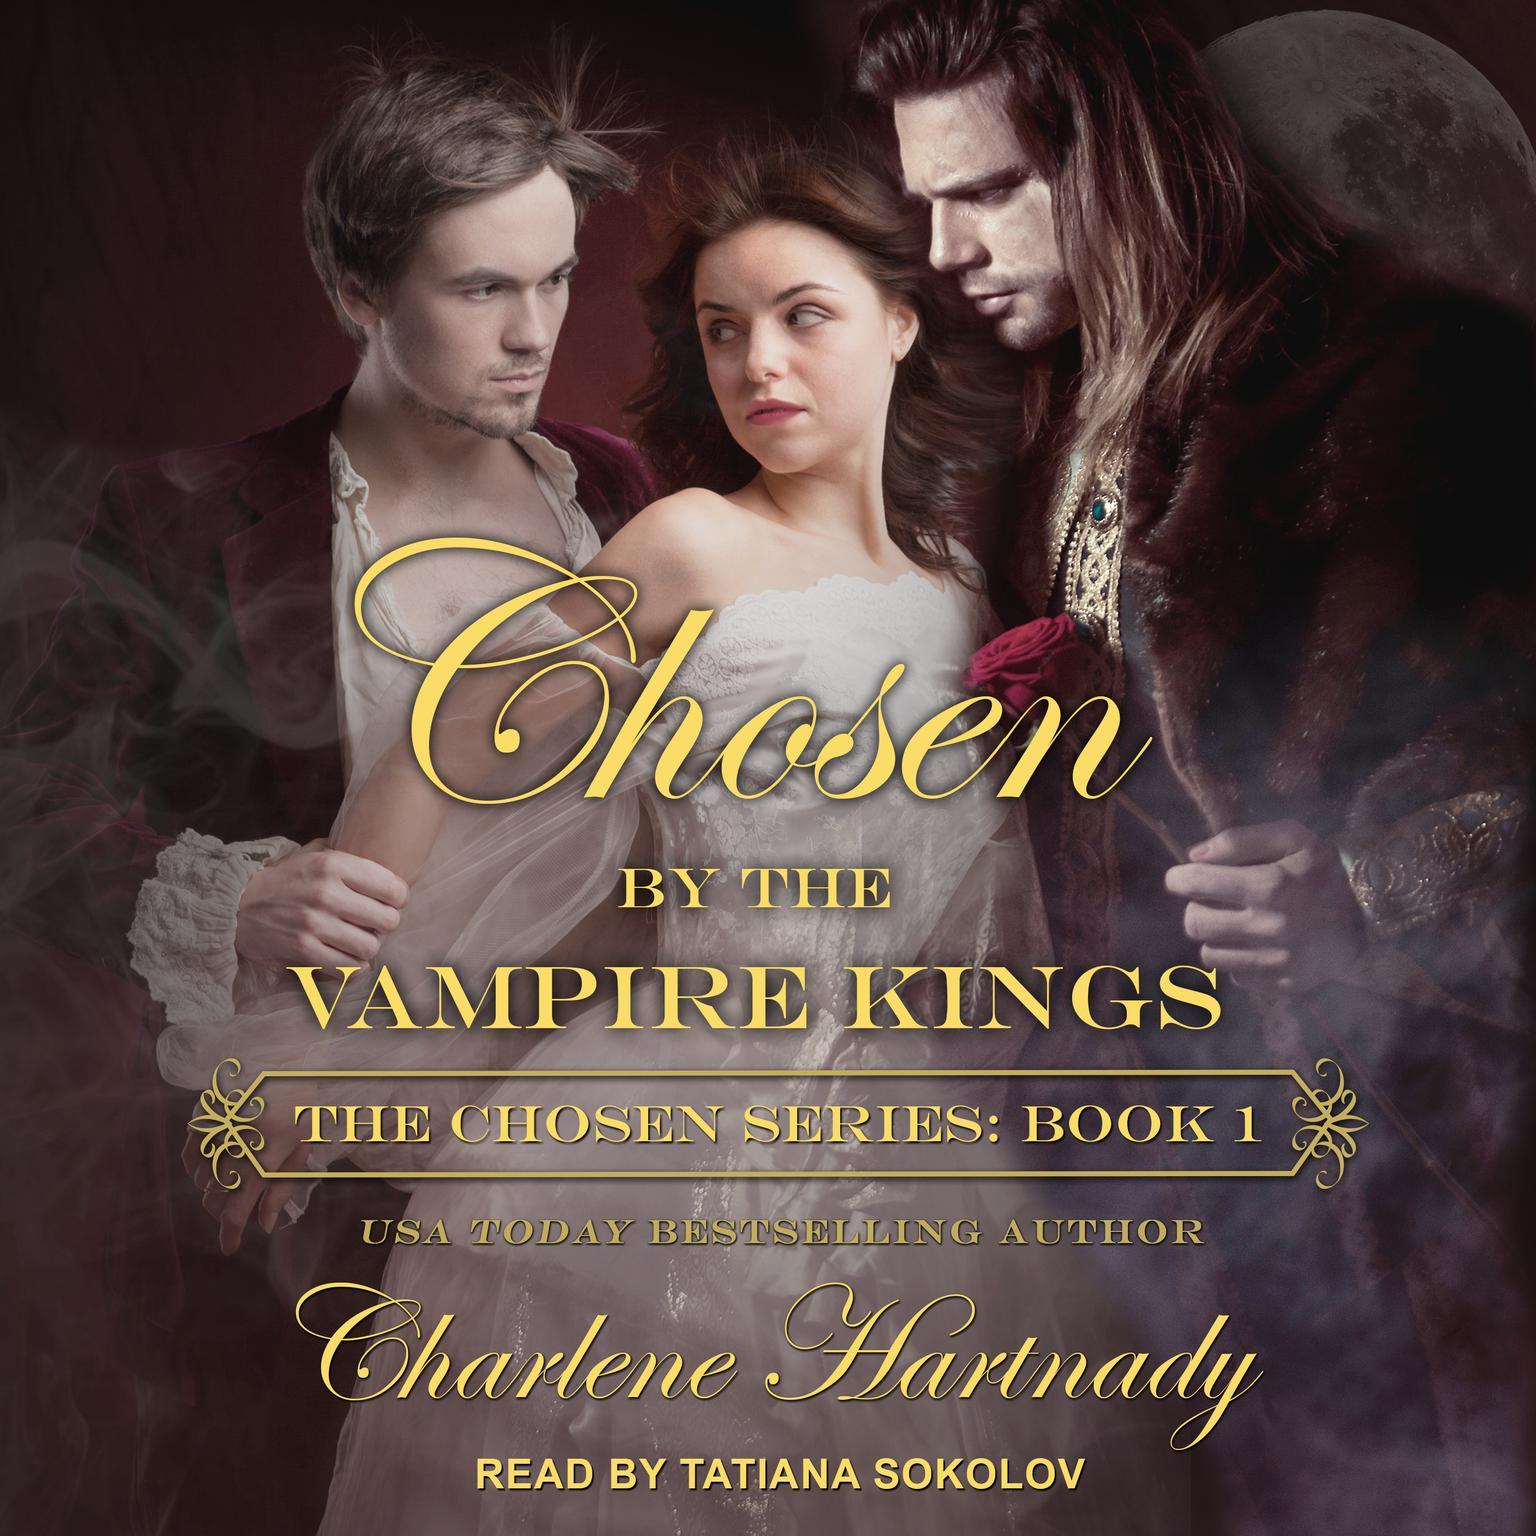 Chosen by the Vampire Kings Audiobook, by Charlene Hartnady